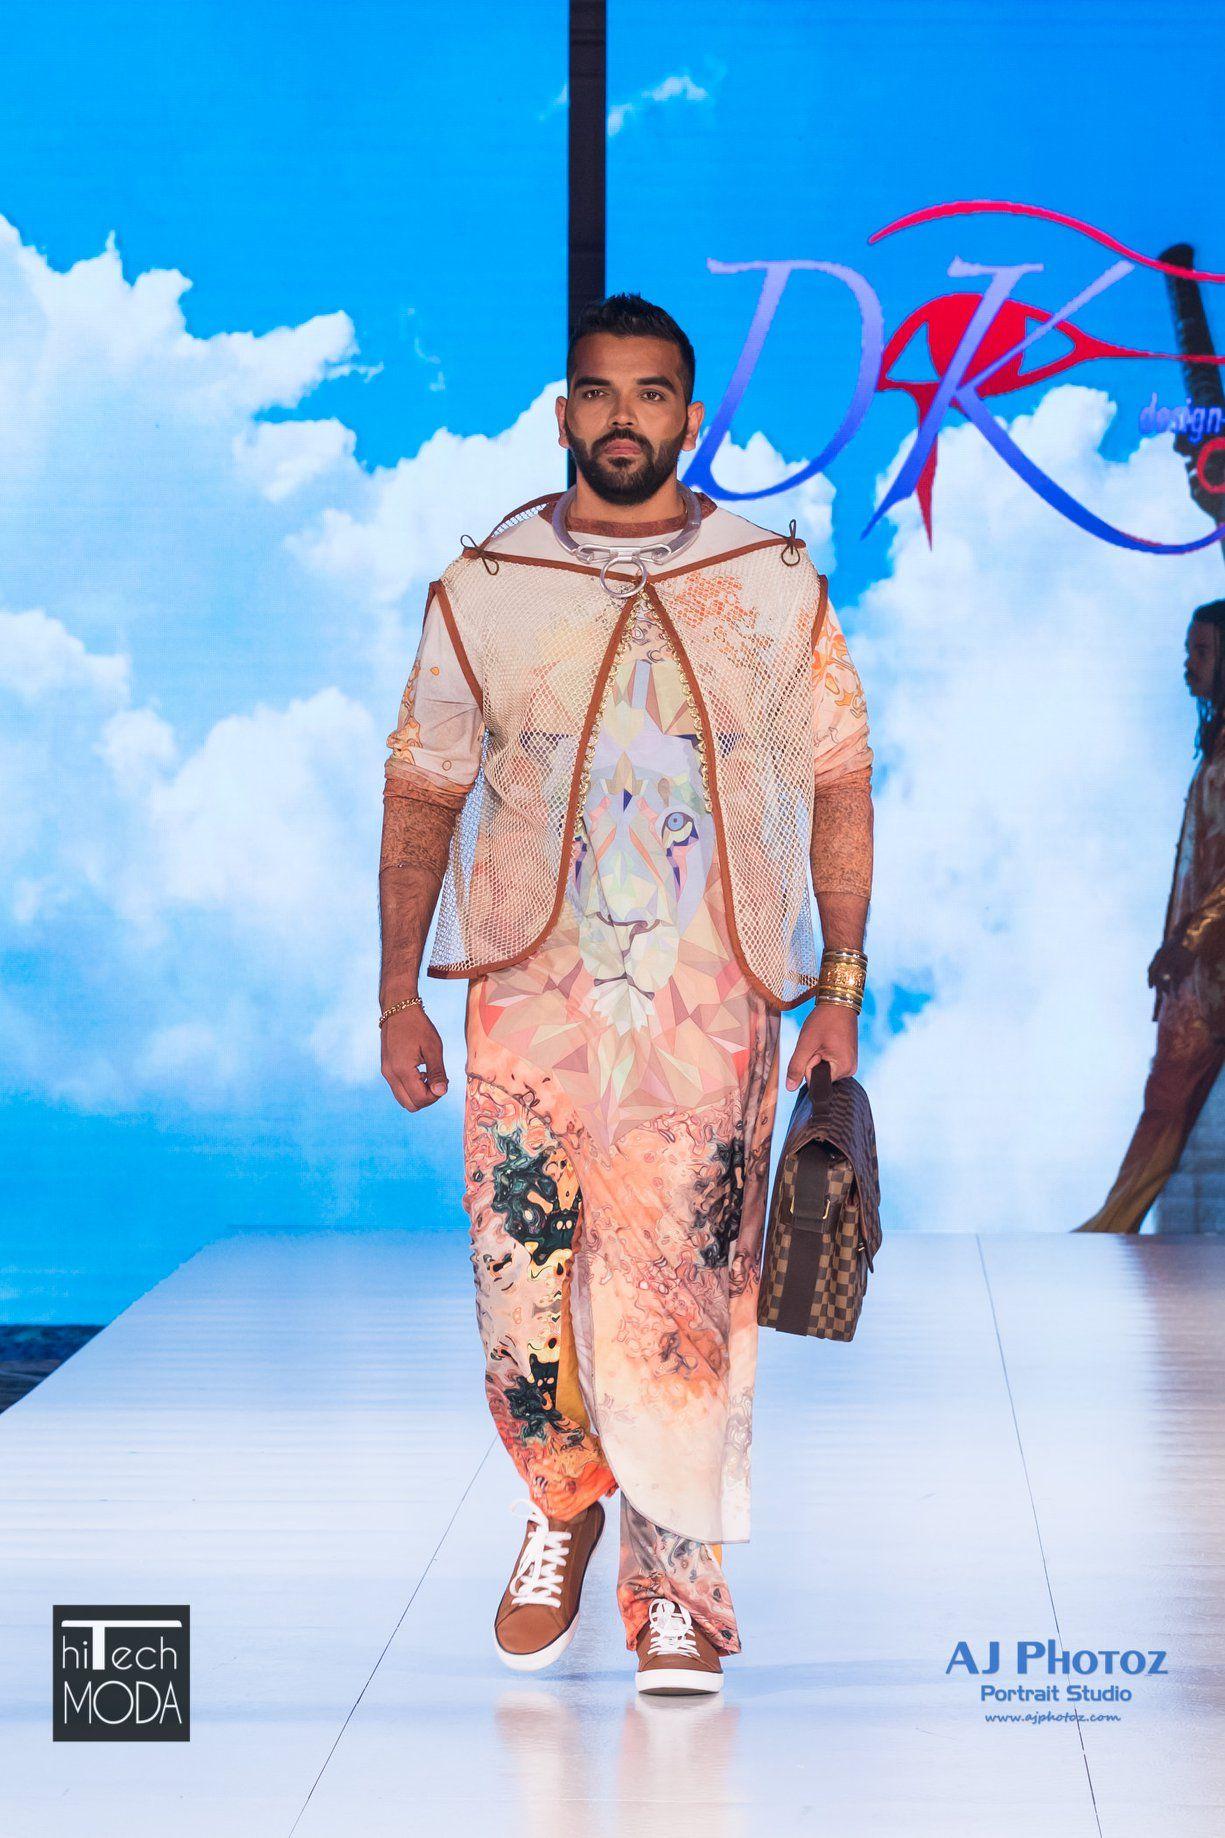 Nyc Fashion Week 2018 Nyfw The Society Fashion Week Designer Next Level World Derrick Grant Accessories Nyc Fashion Week Nyc Fashion Fashion Week 2018